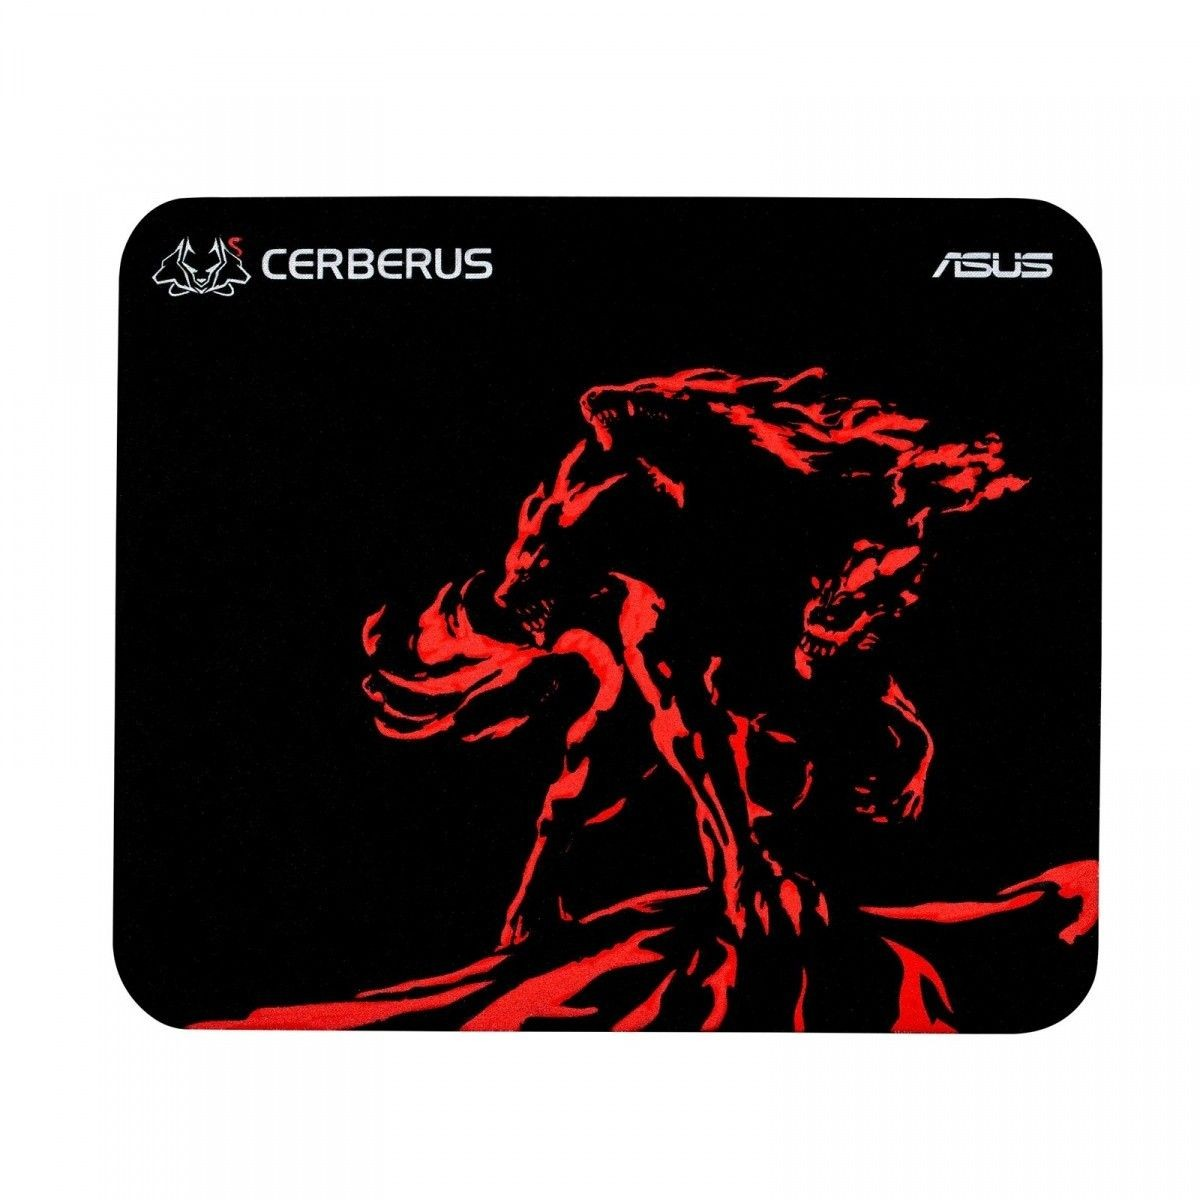 Asus CERBERUS MAT MINI gaming podložka pod myš